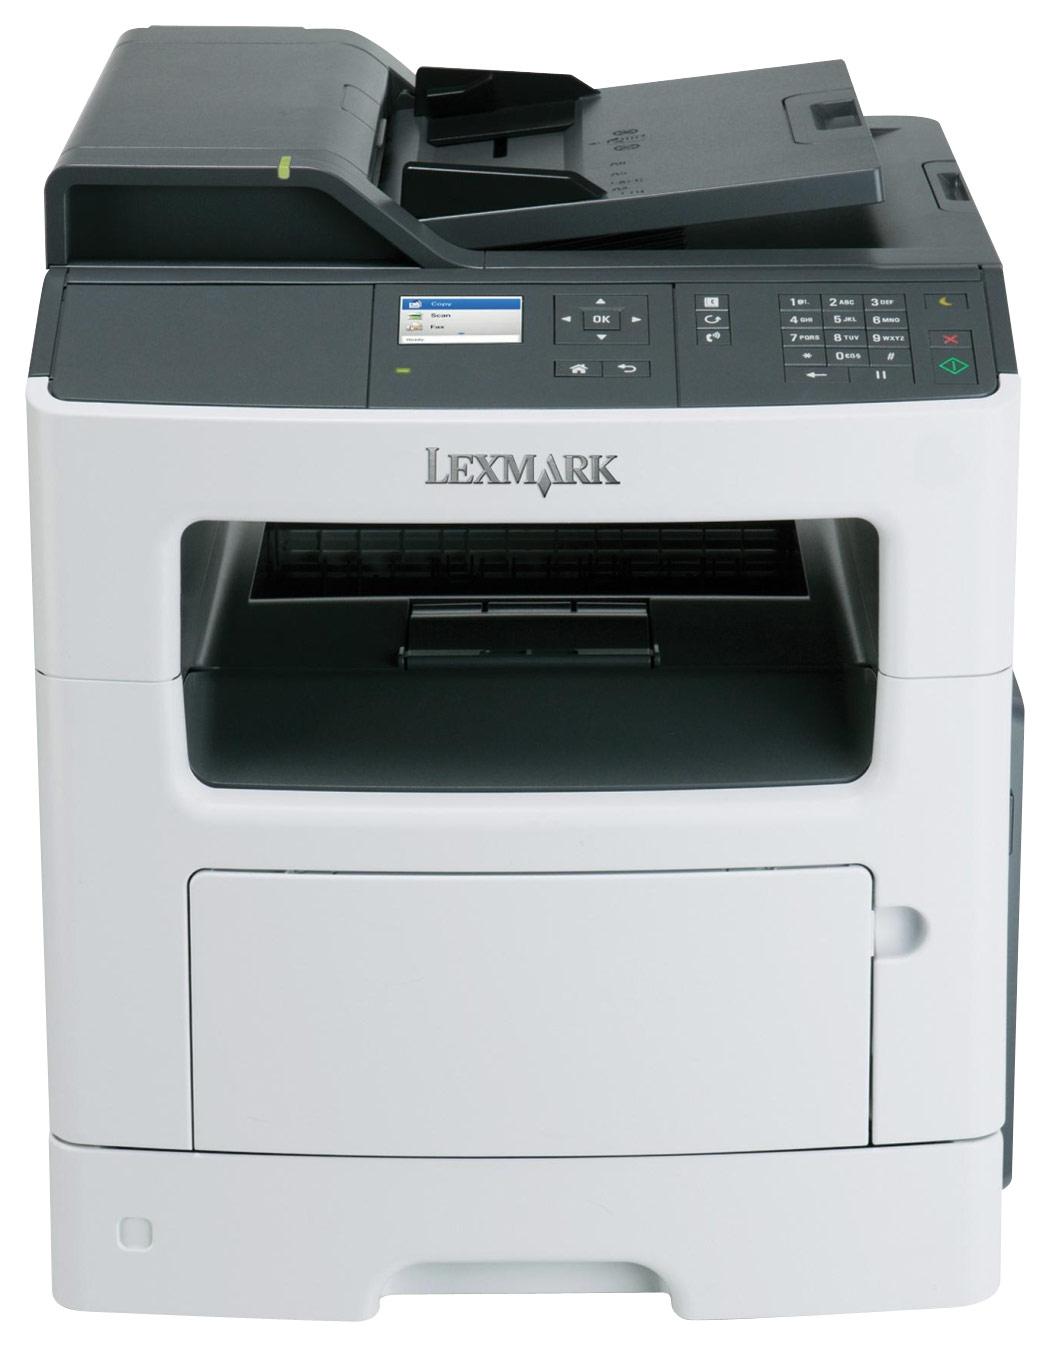 Lexmark - MX410DE Black-and-White All-In-One Printer - White/Black